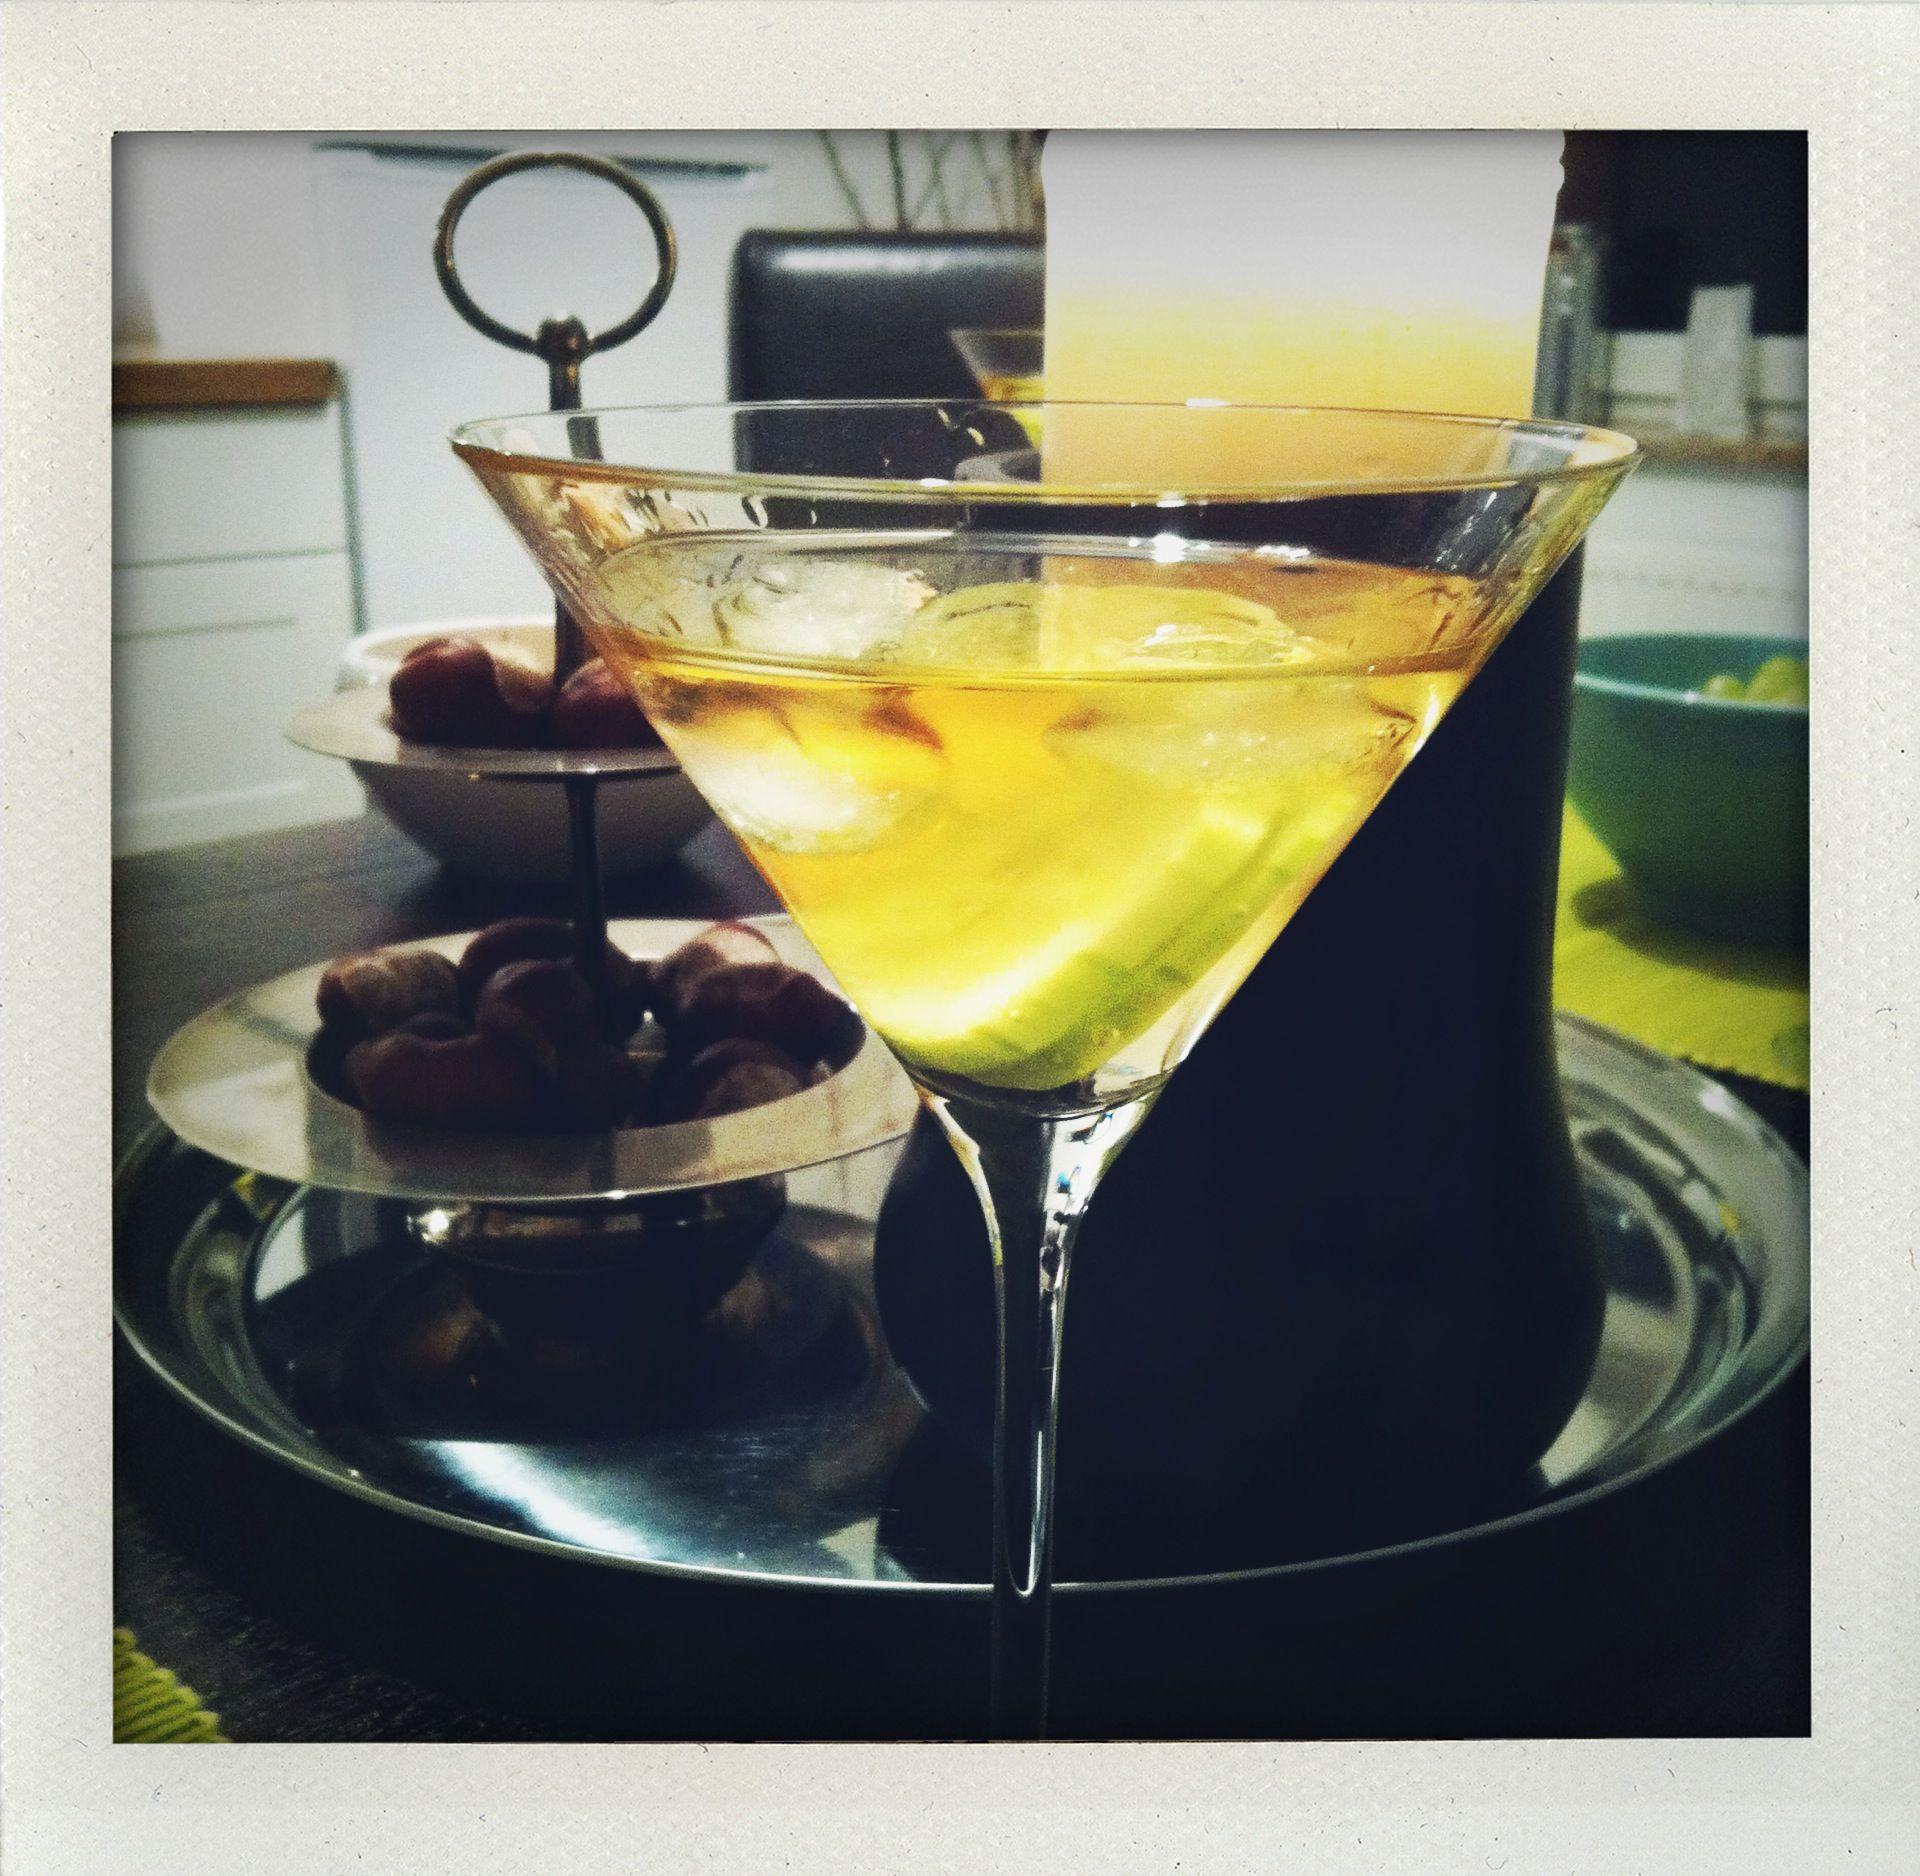 Cucumber Martini | Food. Favorite recipes. Alcoholic drinks